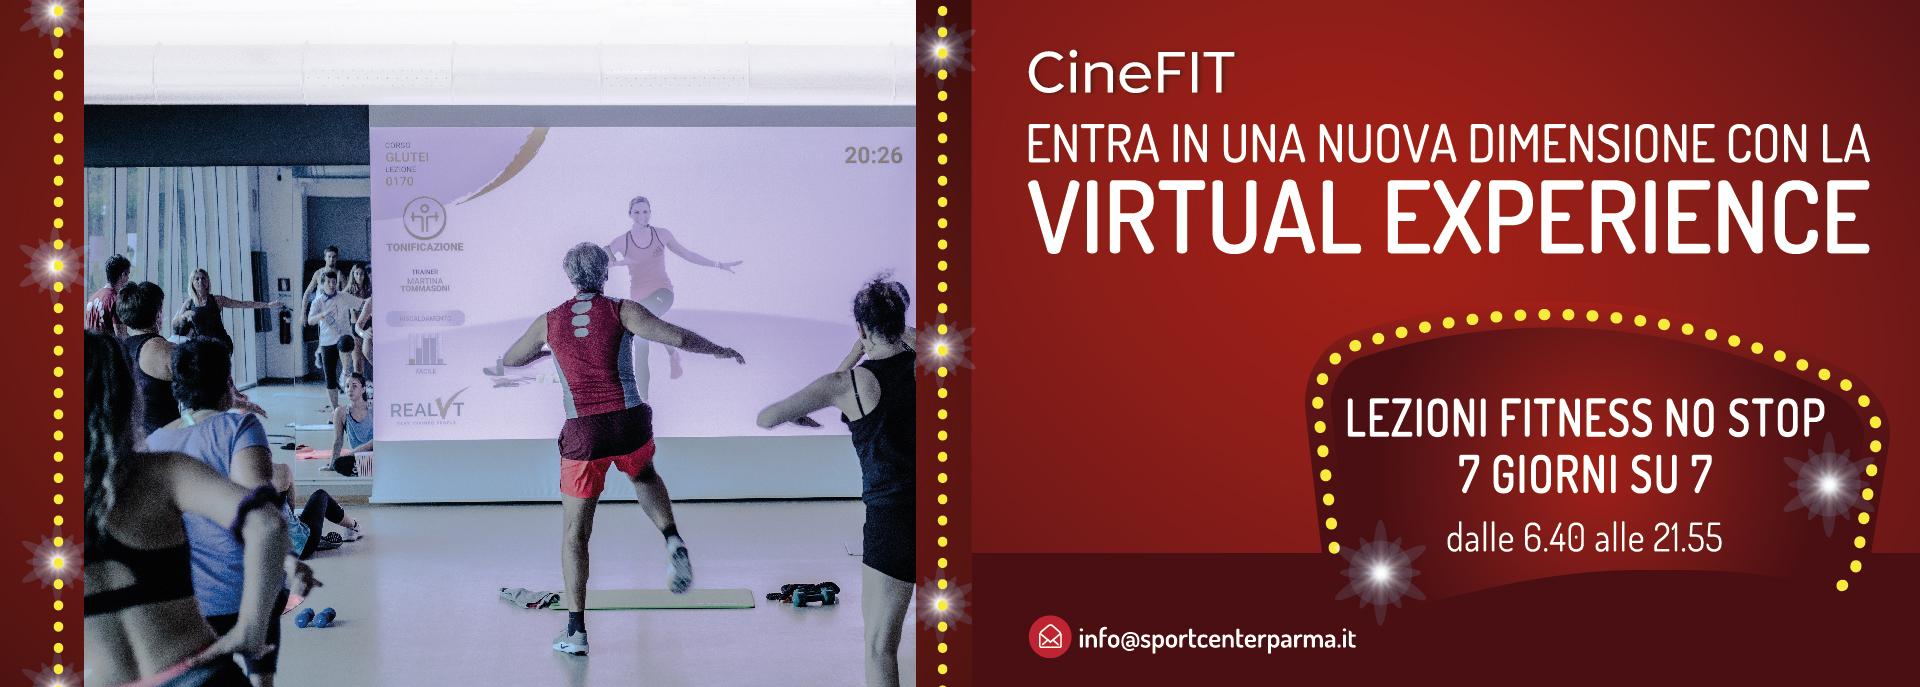 01-esec-slide-sito_virtual-01